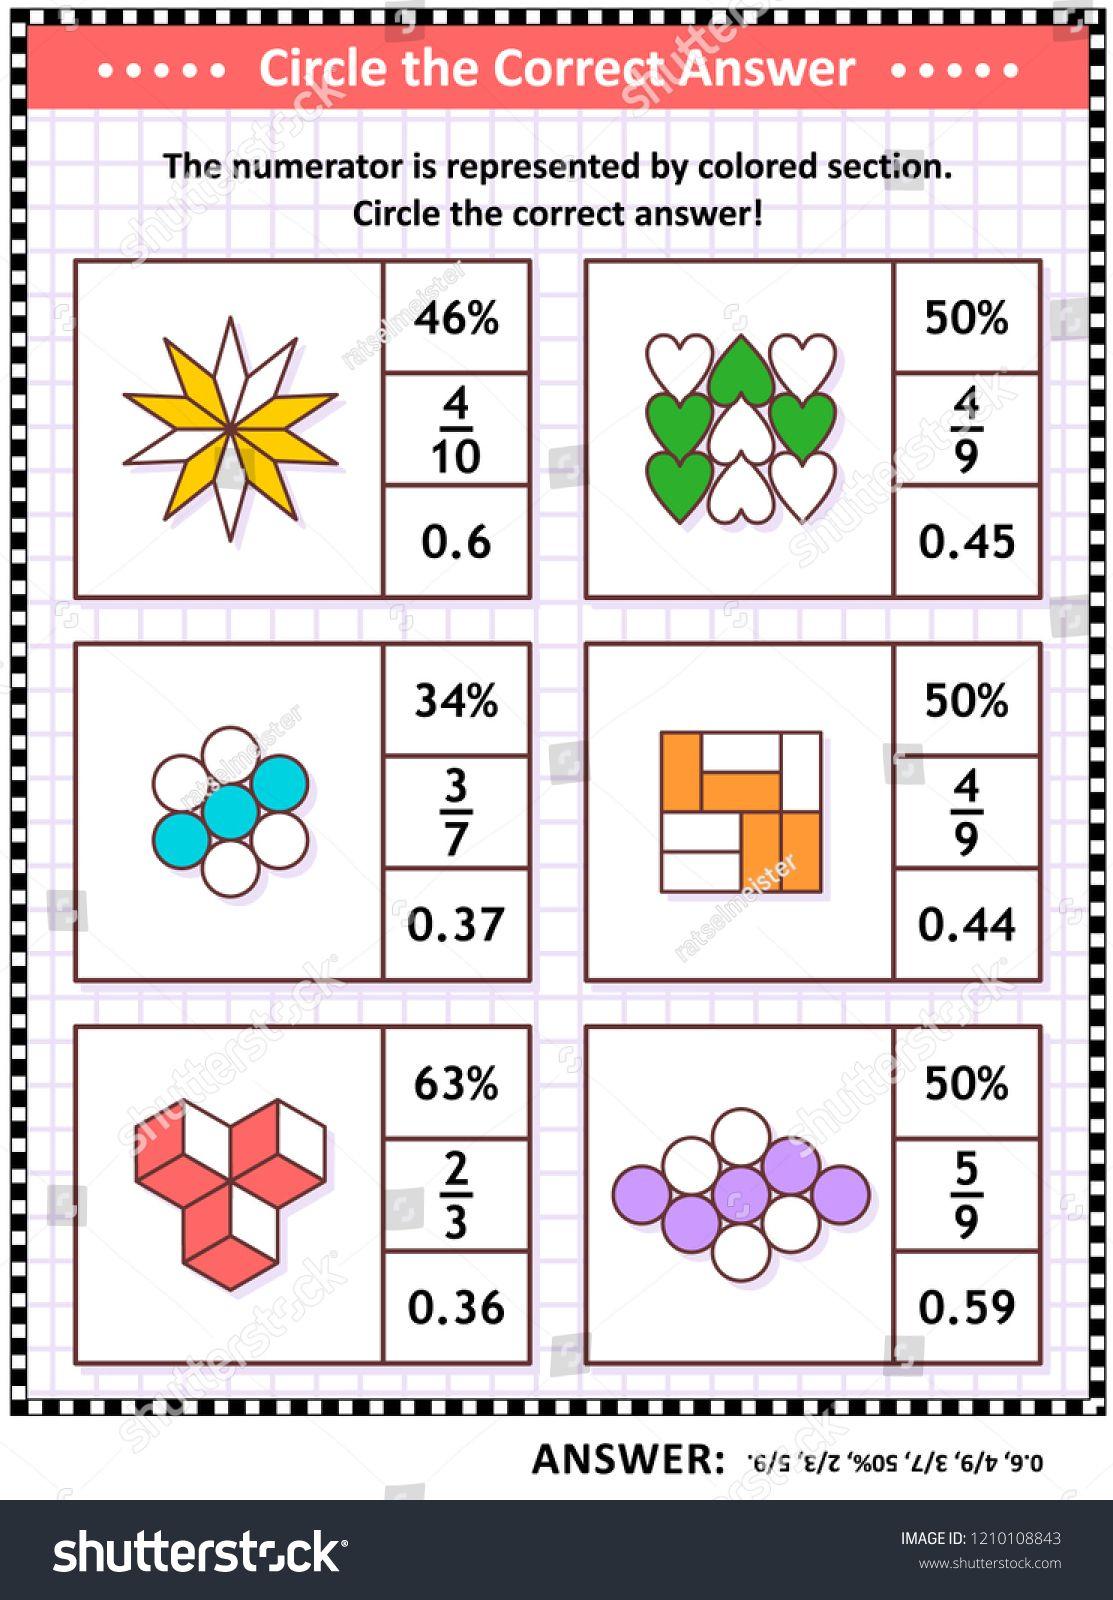 Math Skills And Iq Training Visual Puzzle Or Worksheet For - Worksheet Visual Puzzle